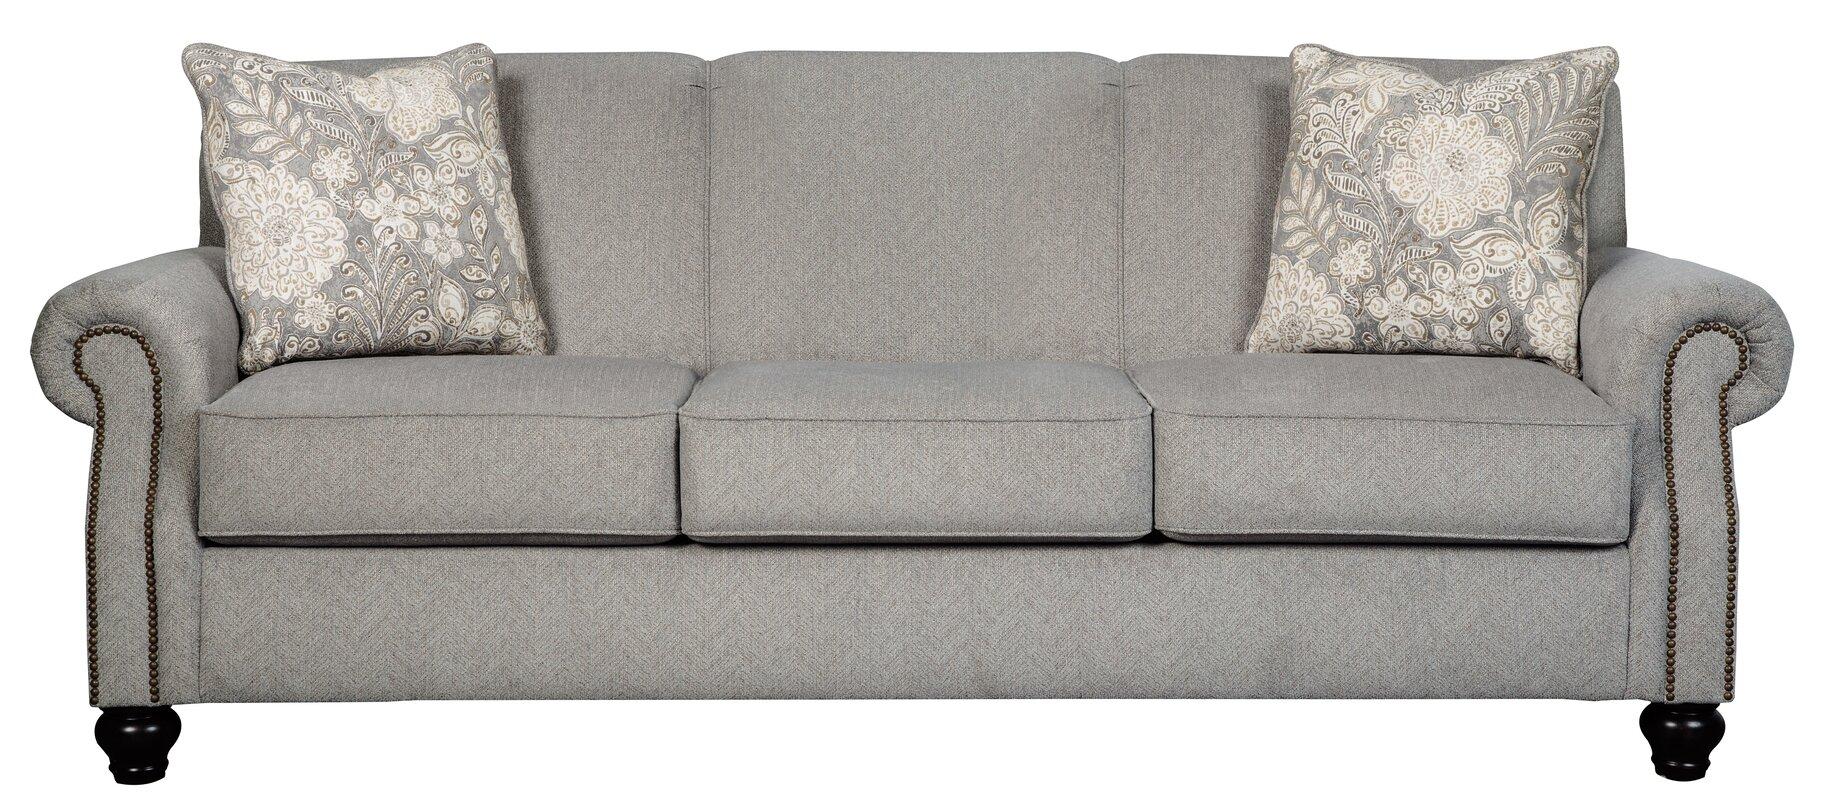 Benchcraft Avelynne Sofa Reviews